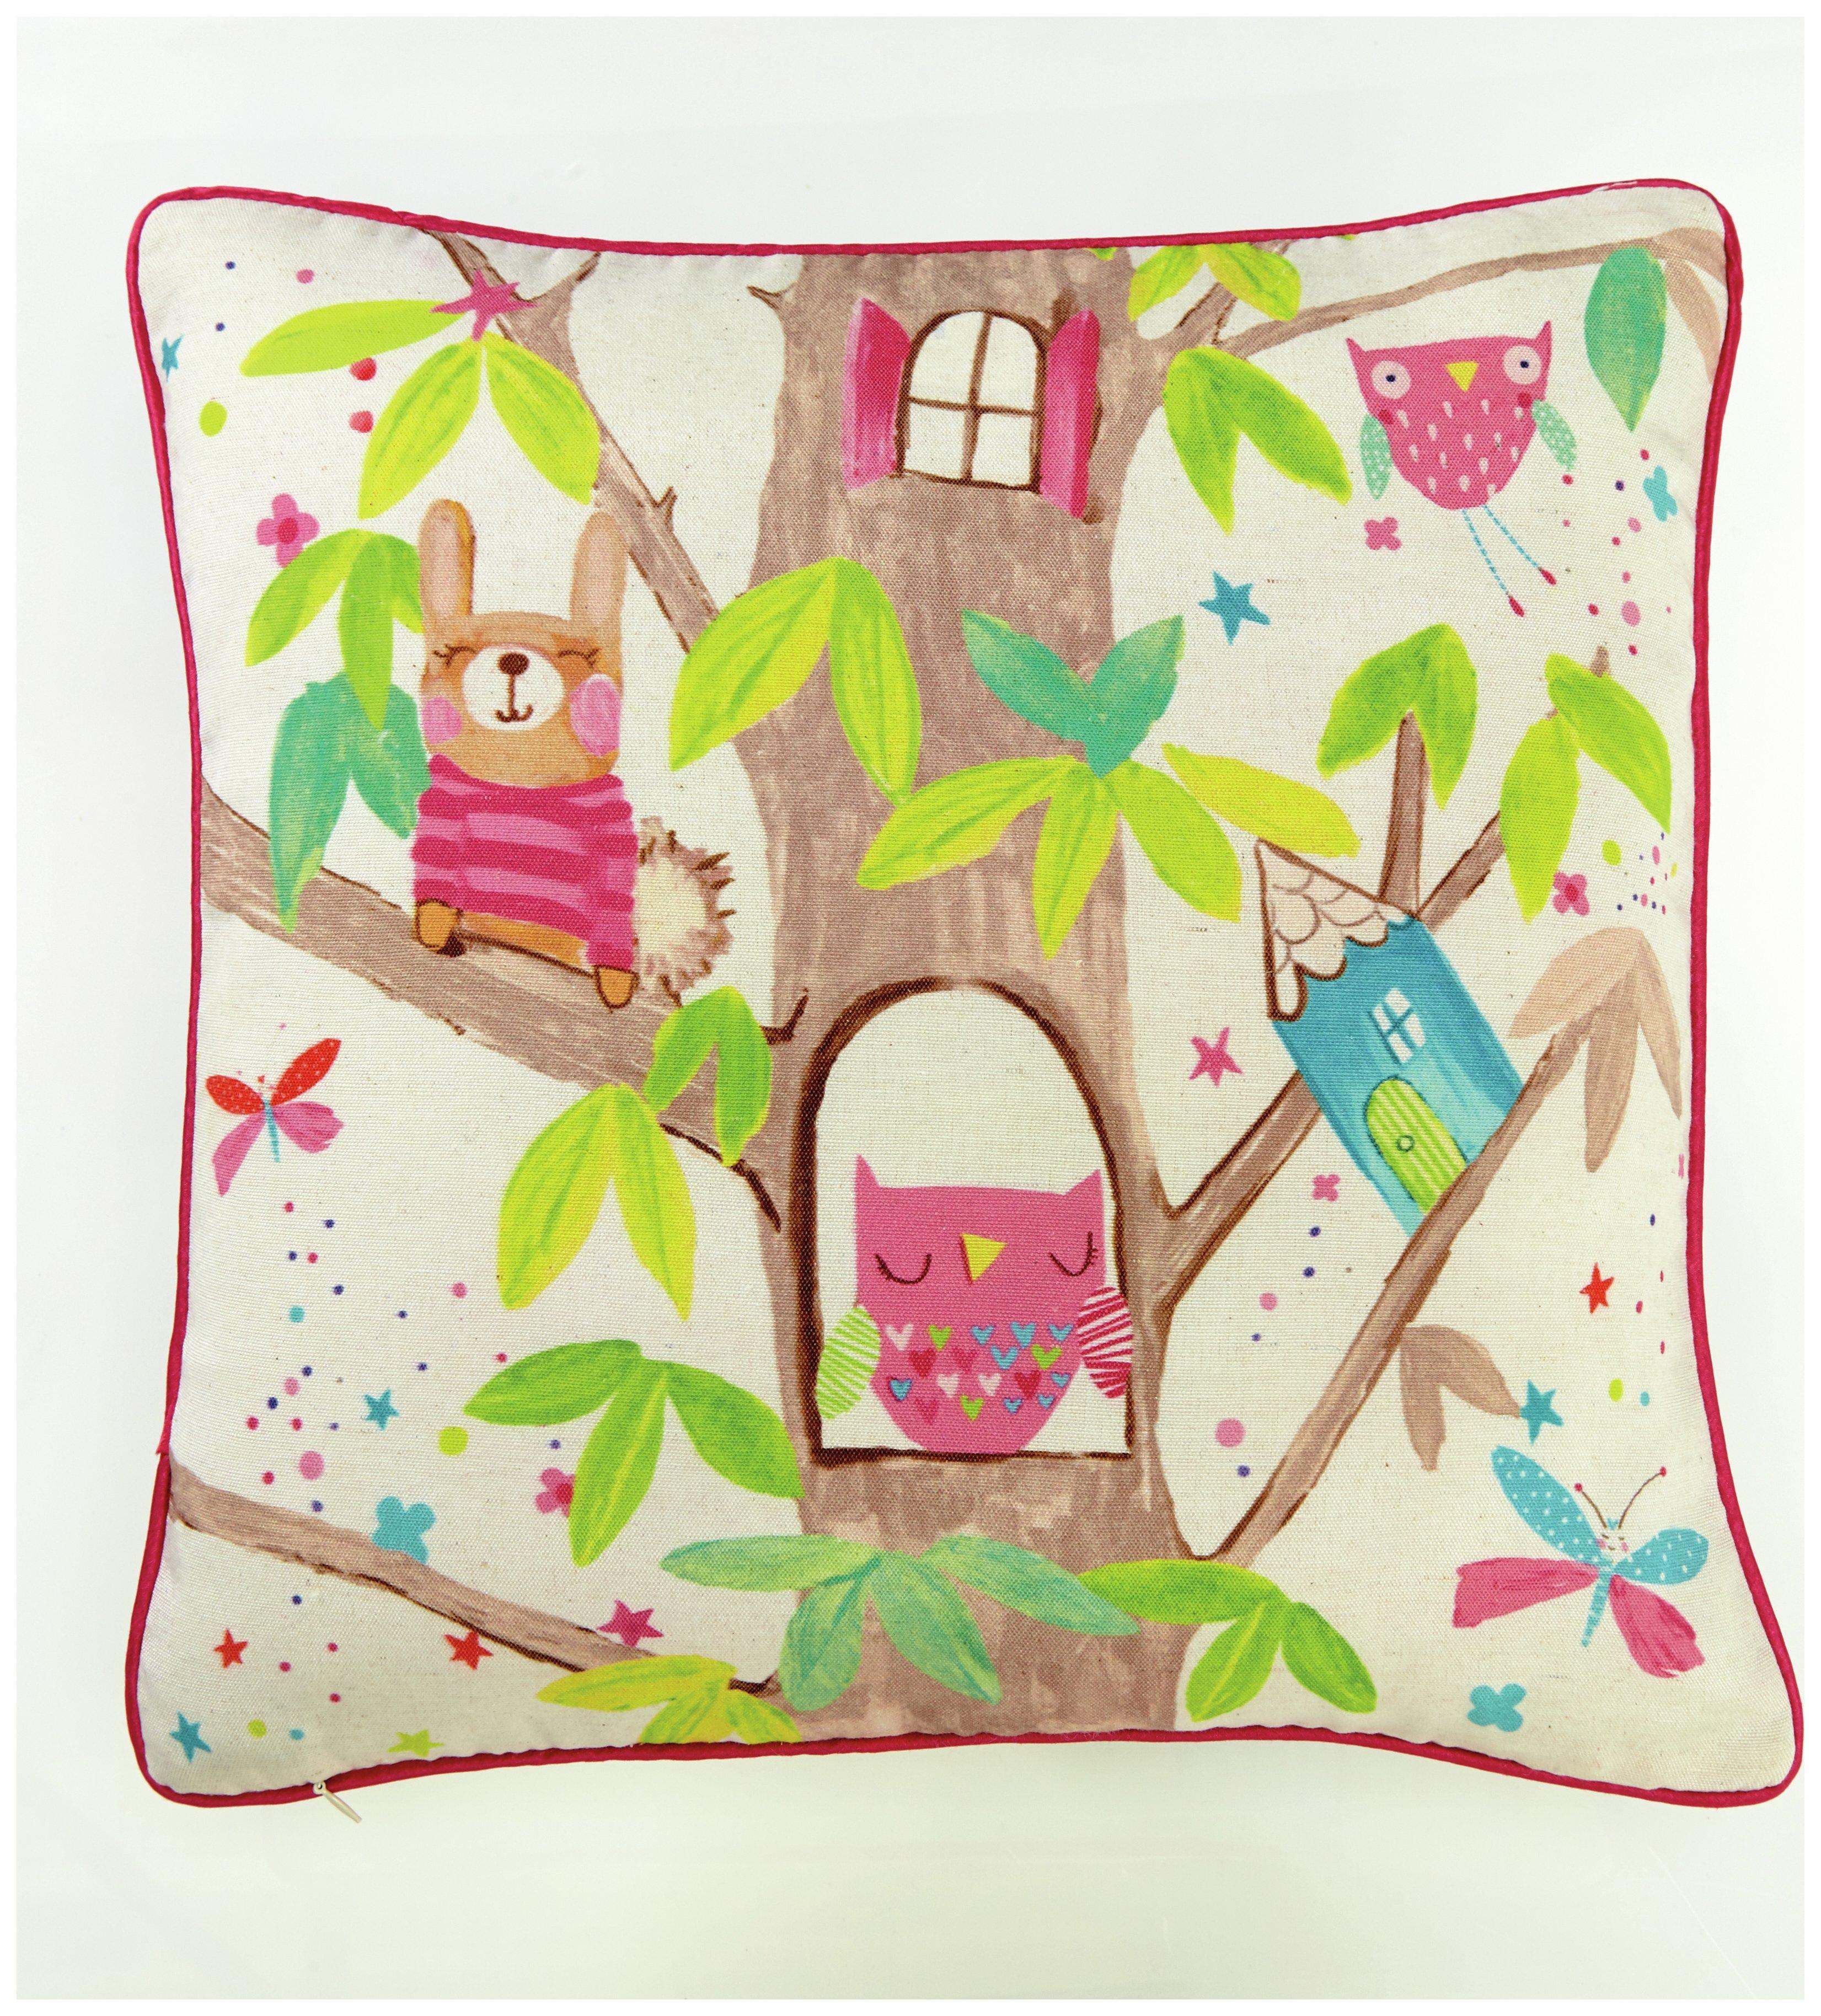 Image of Arthouse Imagine Fun Enchanted Fairies Cushion - Pink